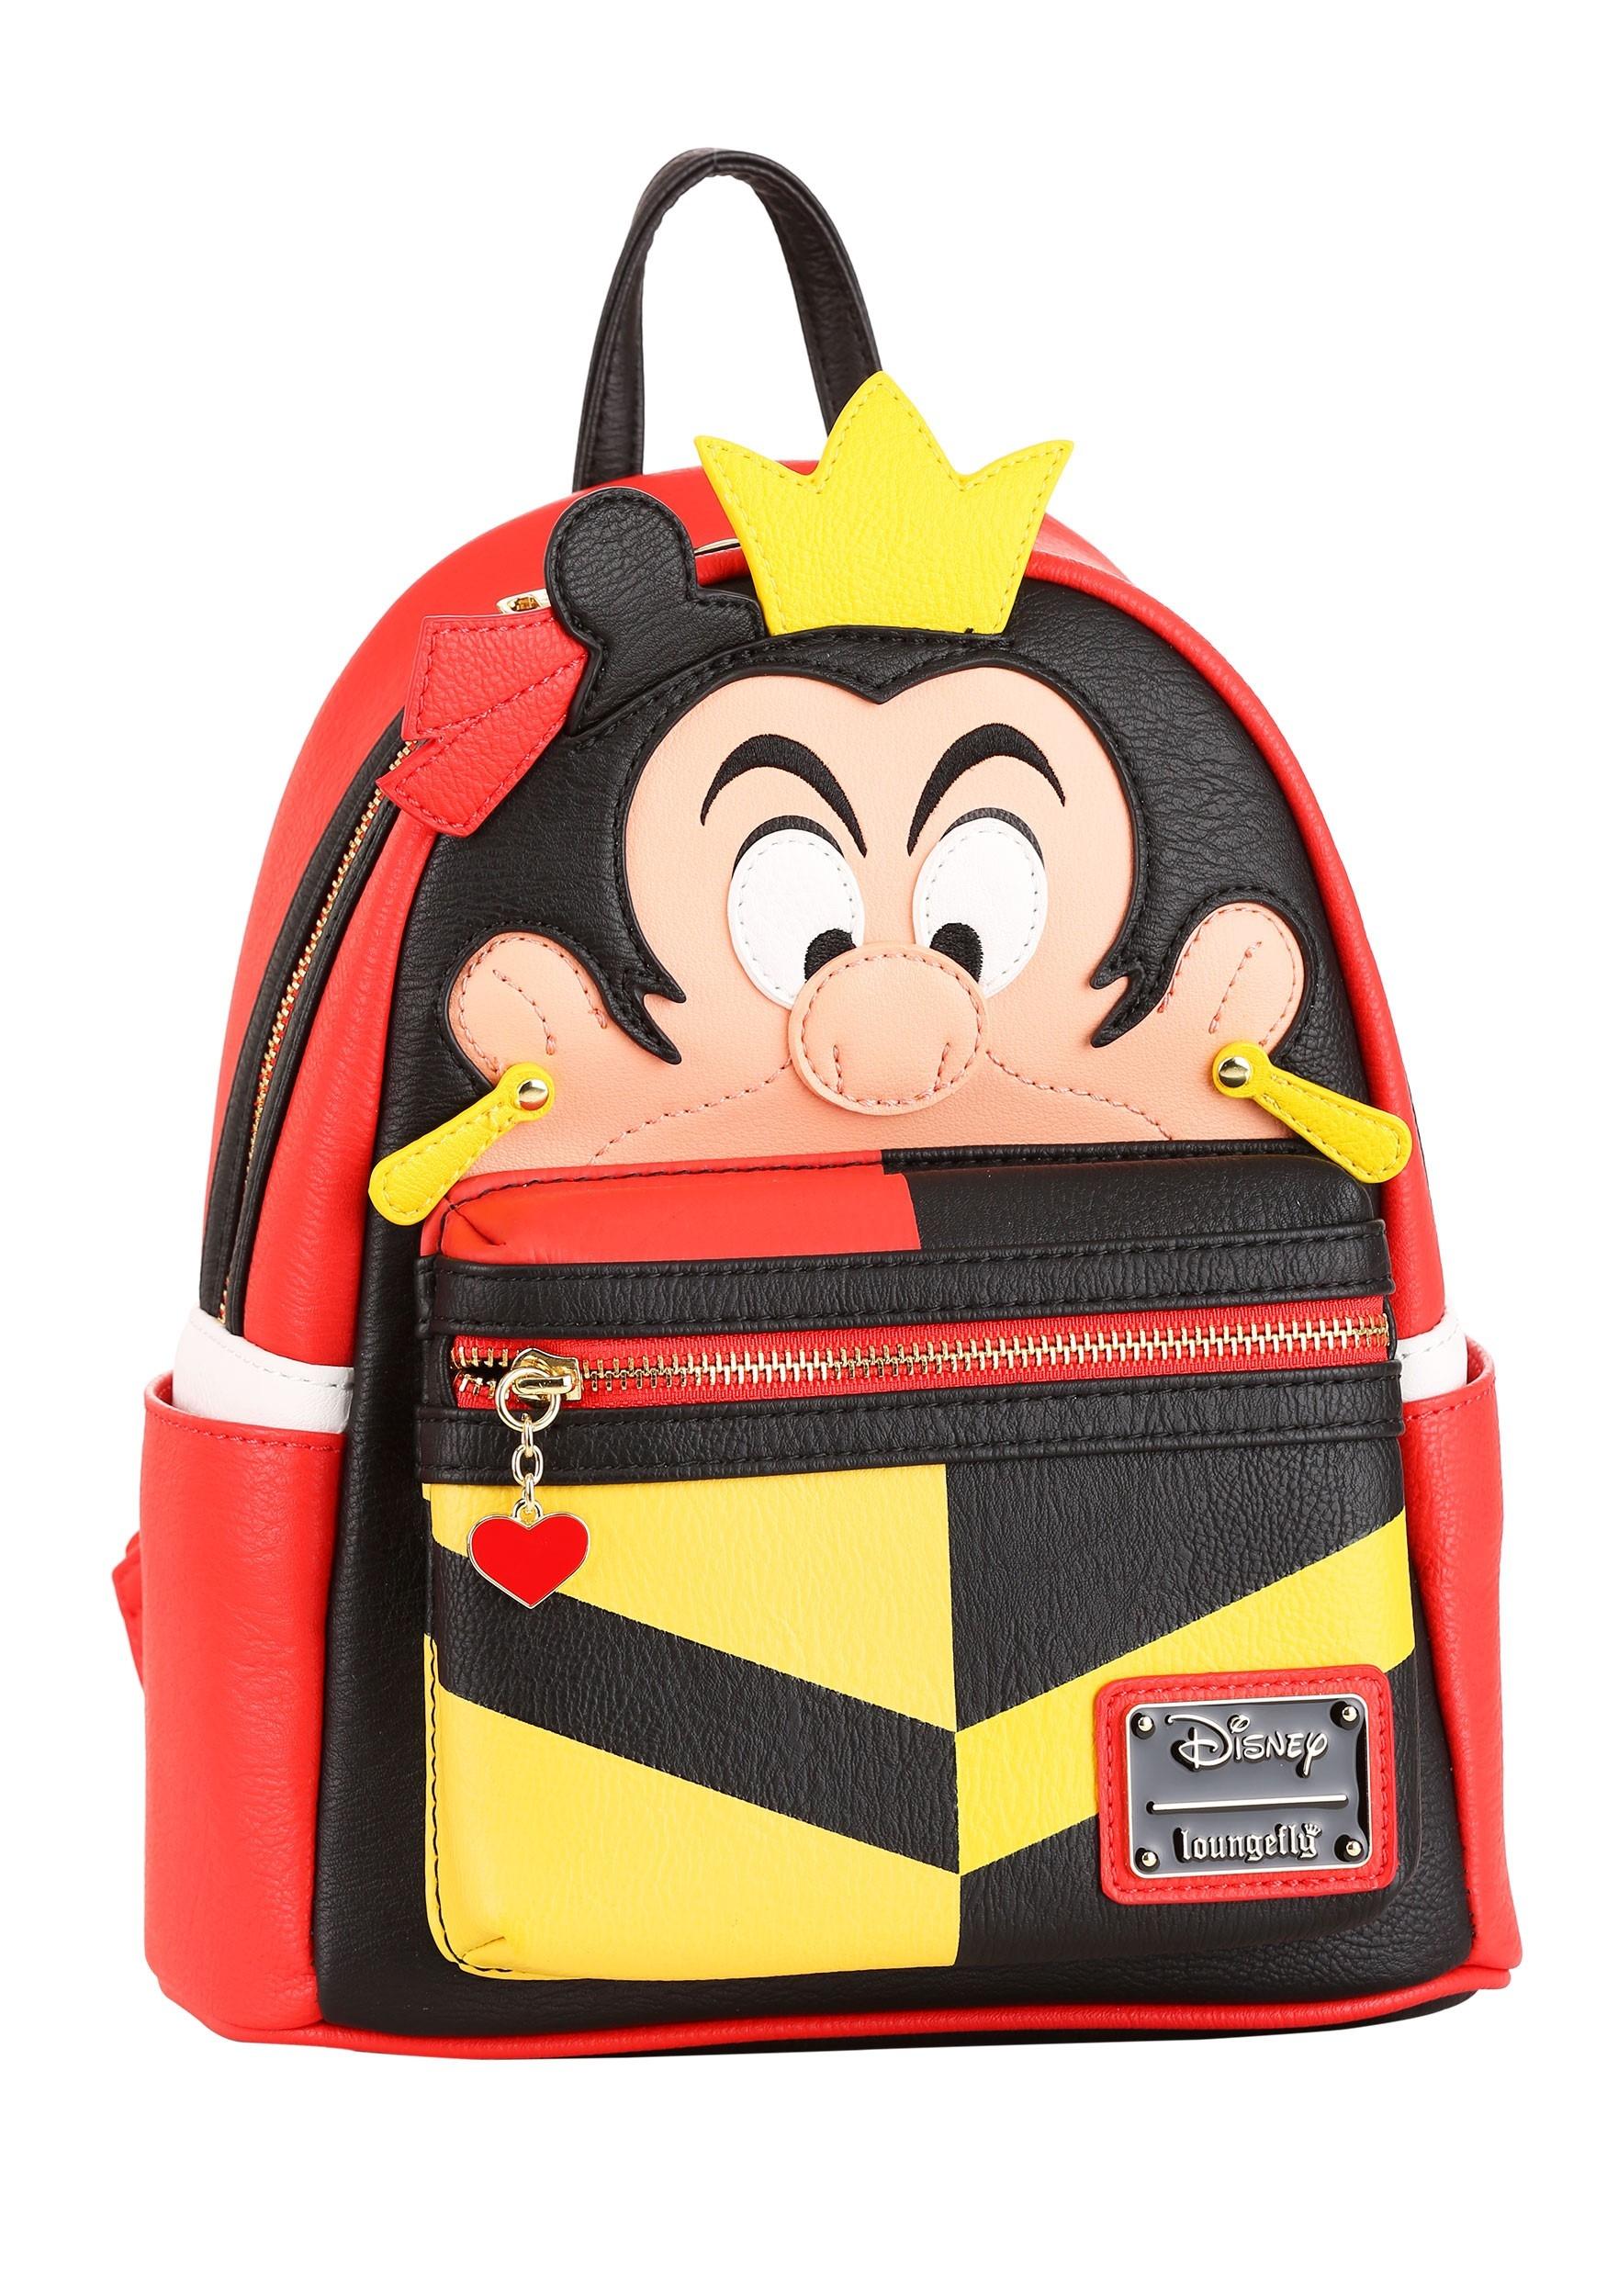 Loungefly disney backpacks